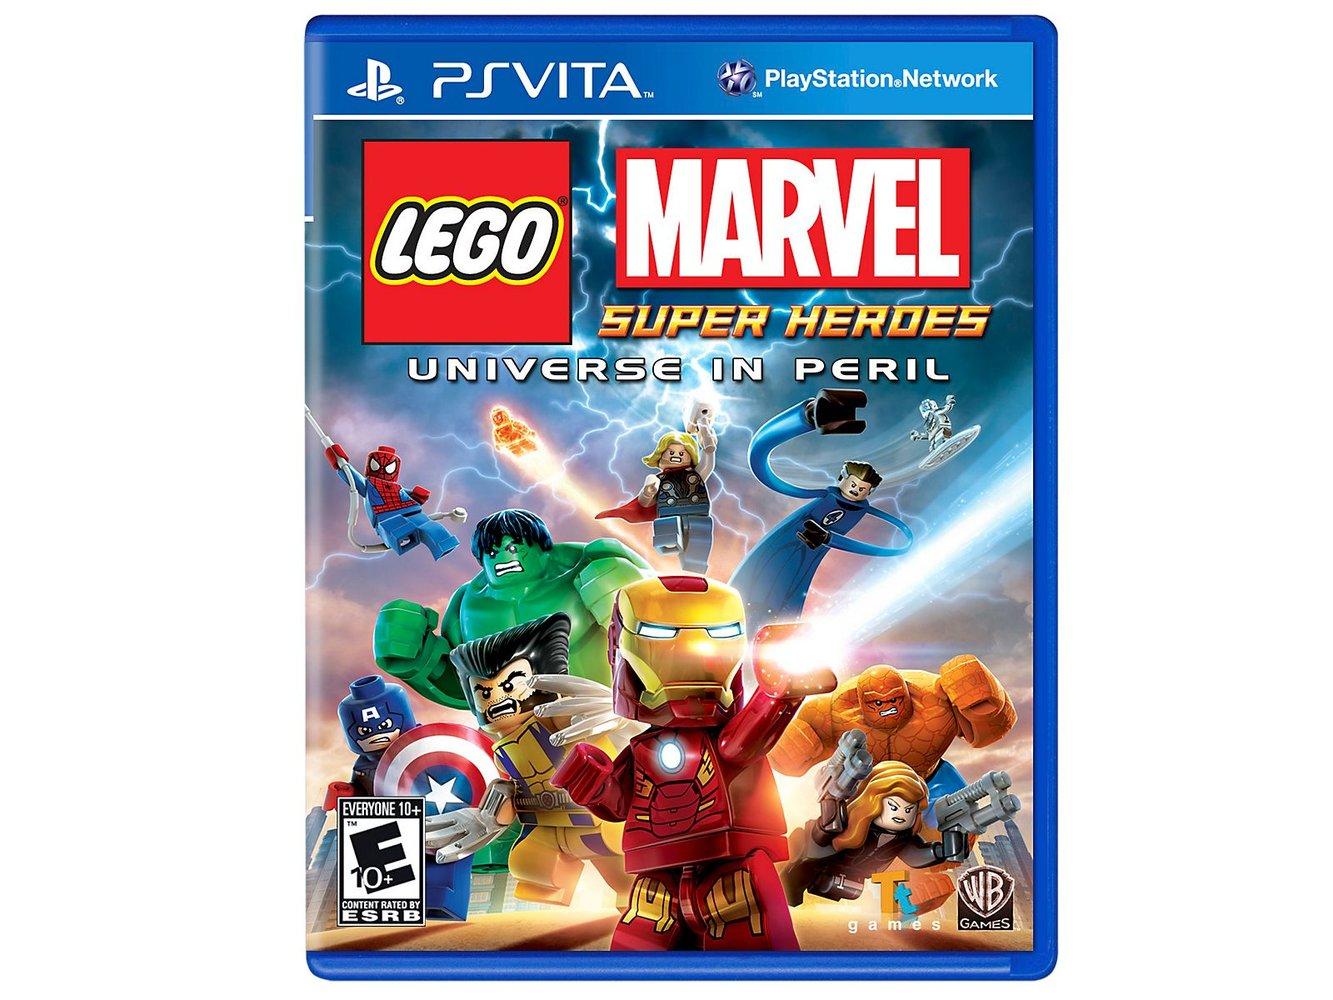 Marvel Super Heroes Video Game - PS Vita